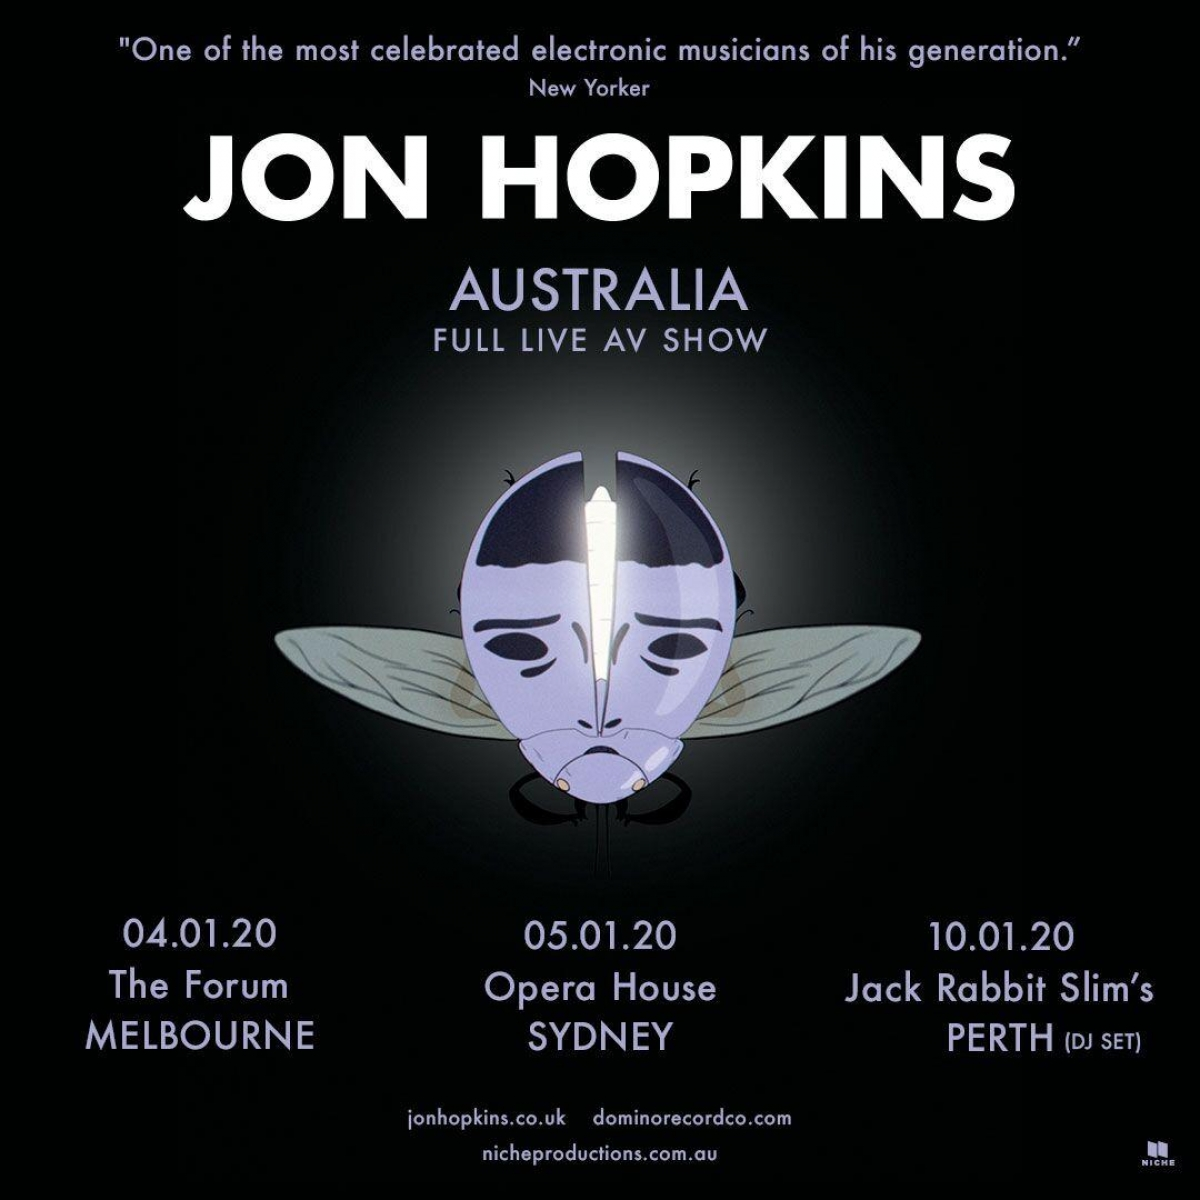 Australian tour dates - January 2020